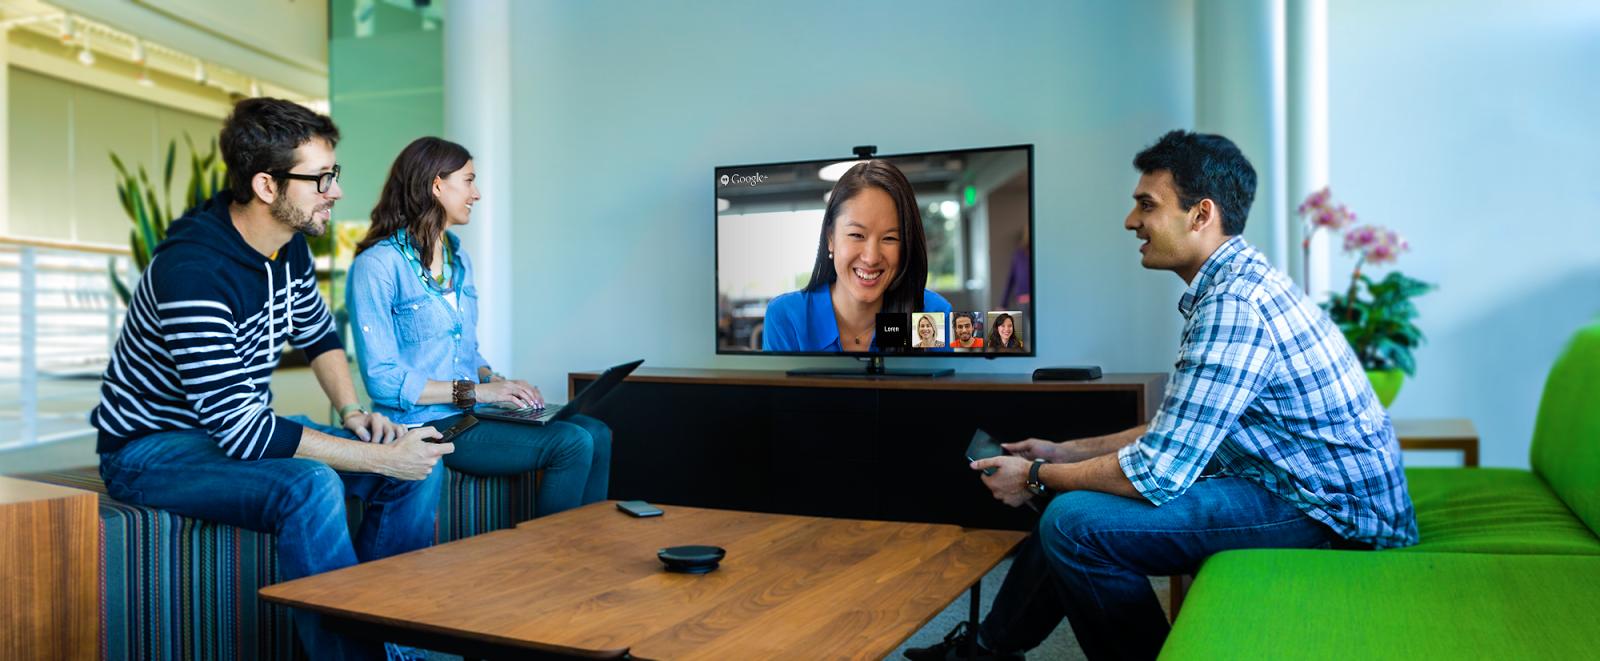 Meeting Room New Companies Google